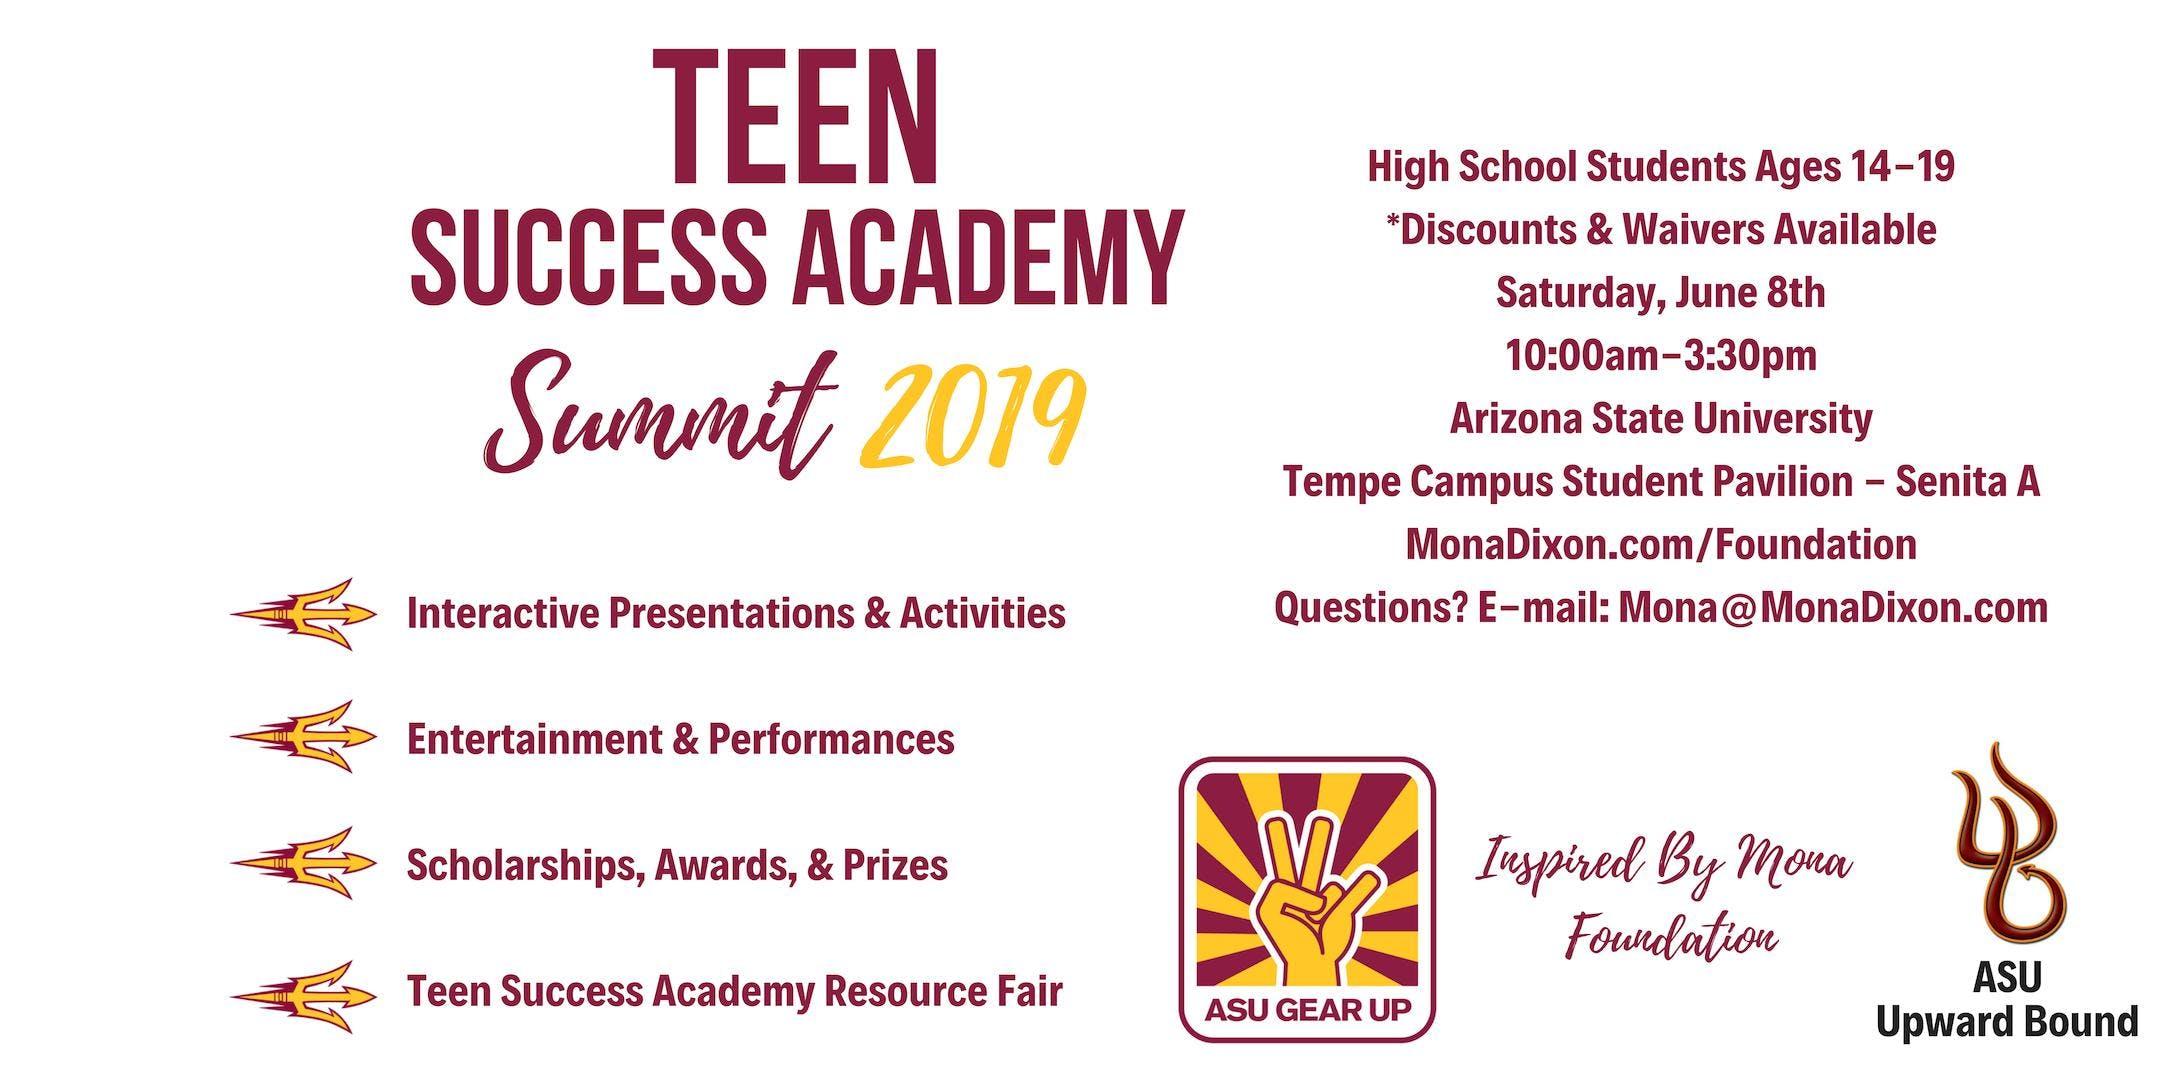 Teen Success Academy Summit 2019